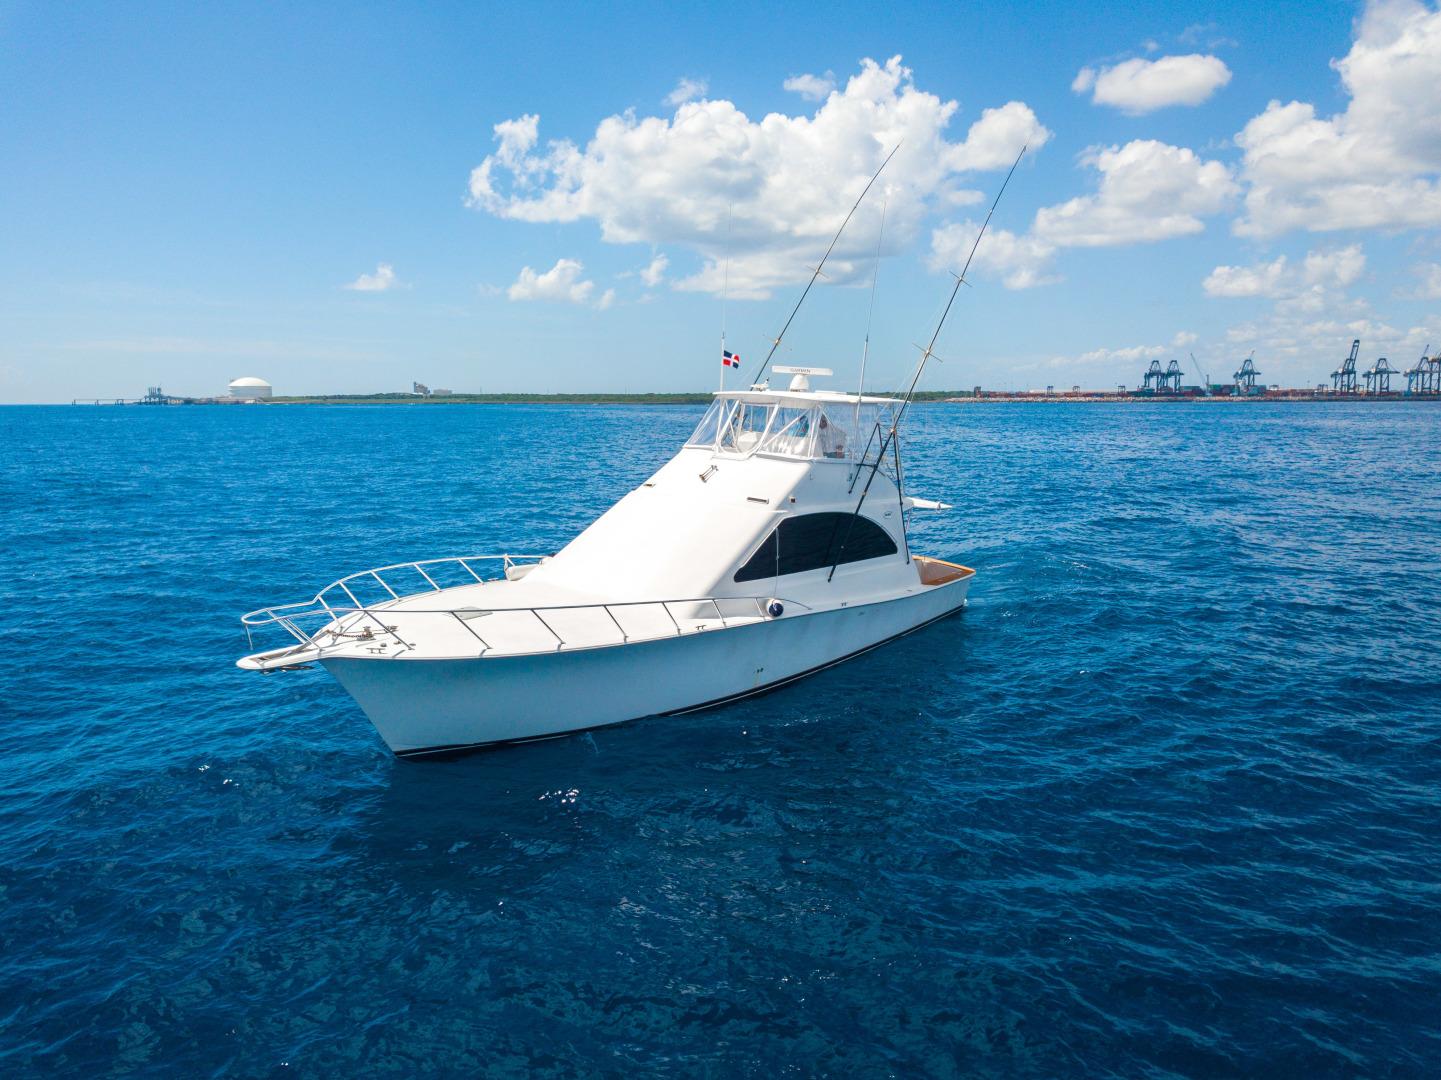 52 2001 Ocean Yachts Profile